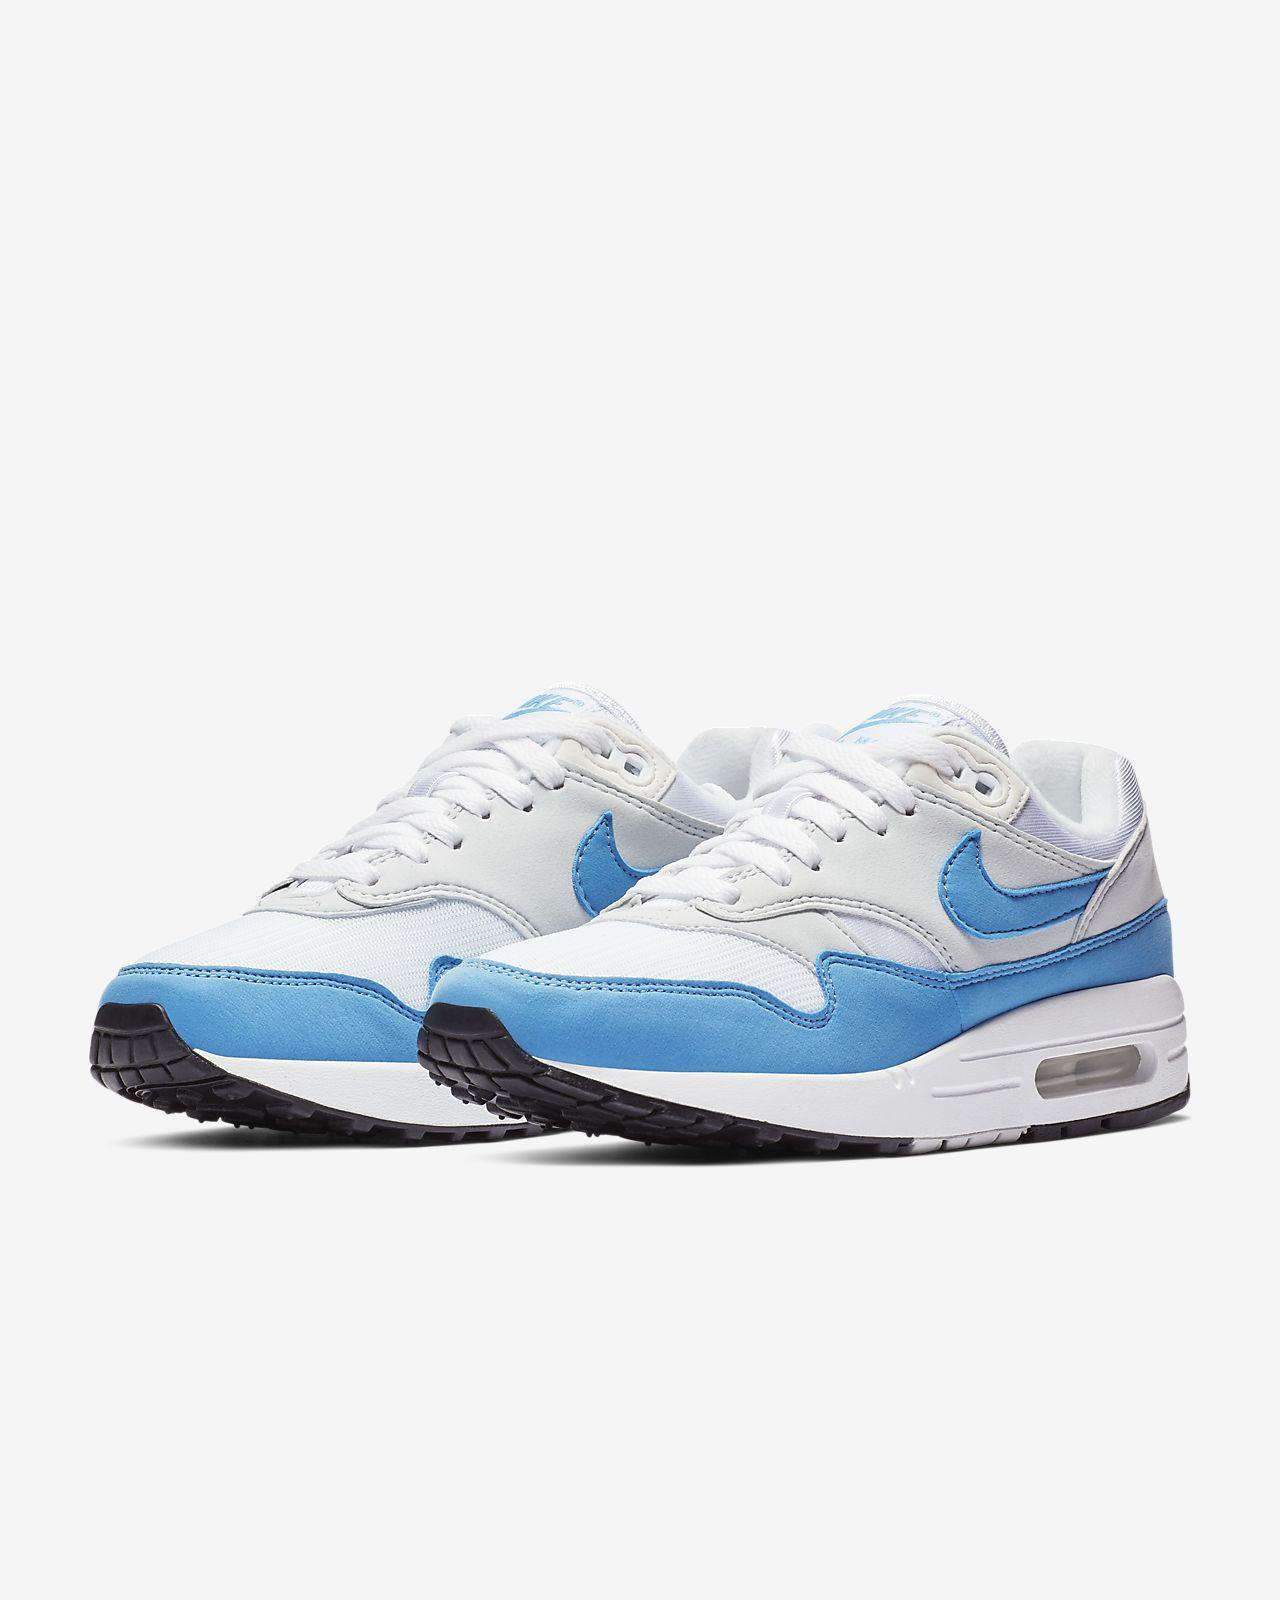 innovative design 5fdaa 2e194 ... Nike Air Max 1 Essential Women s Shoe